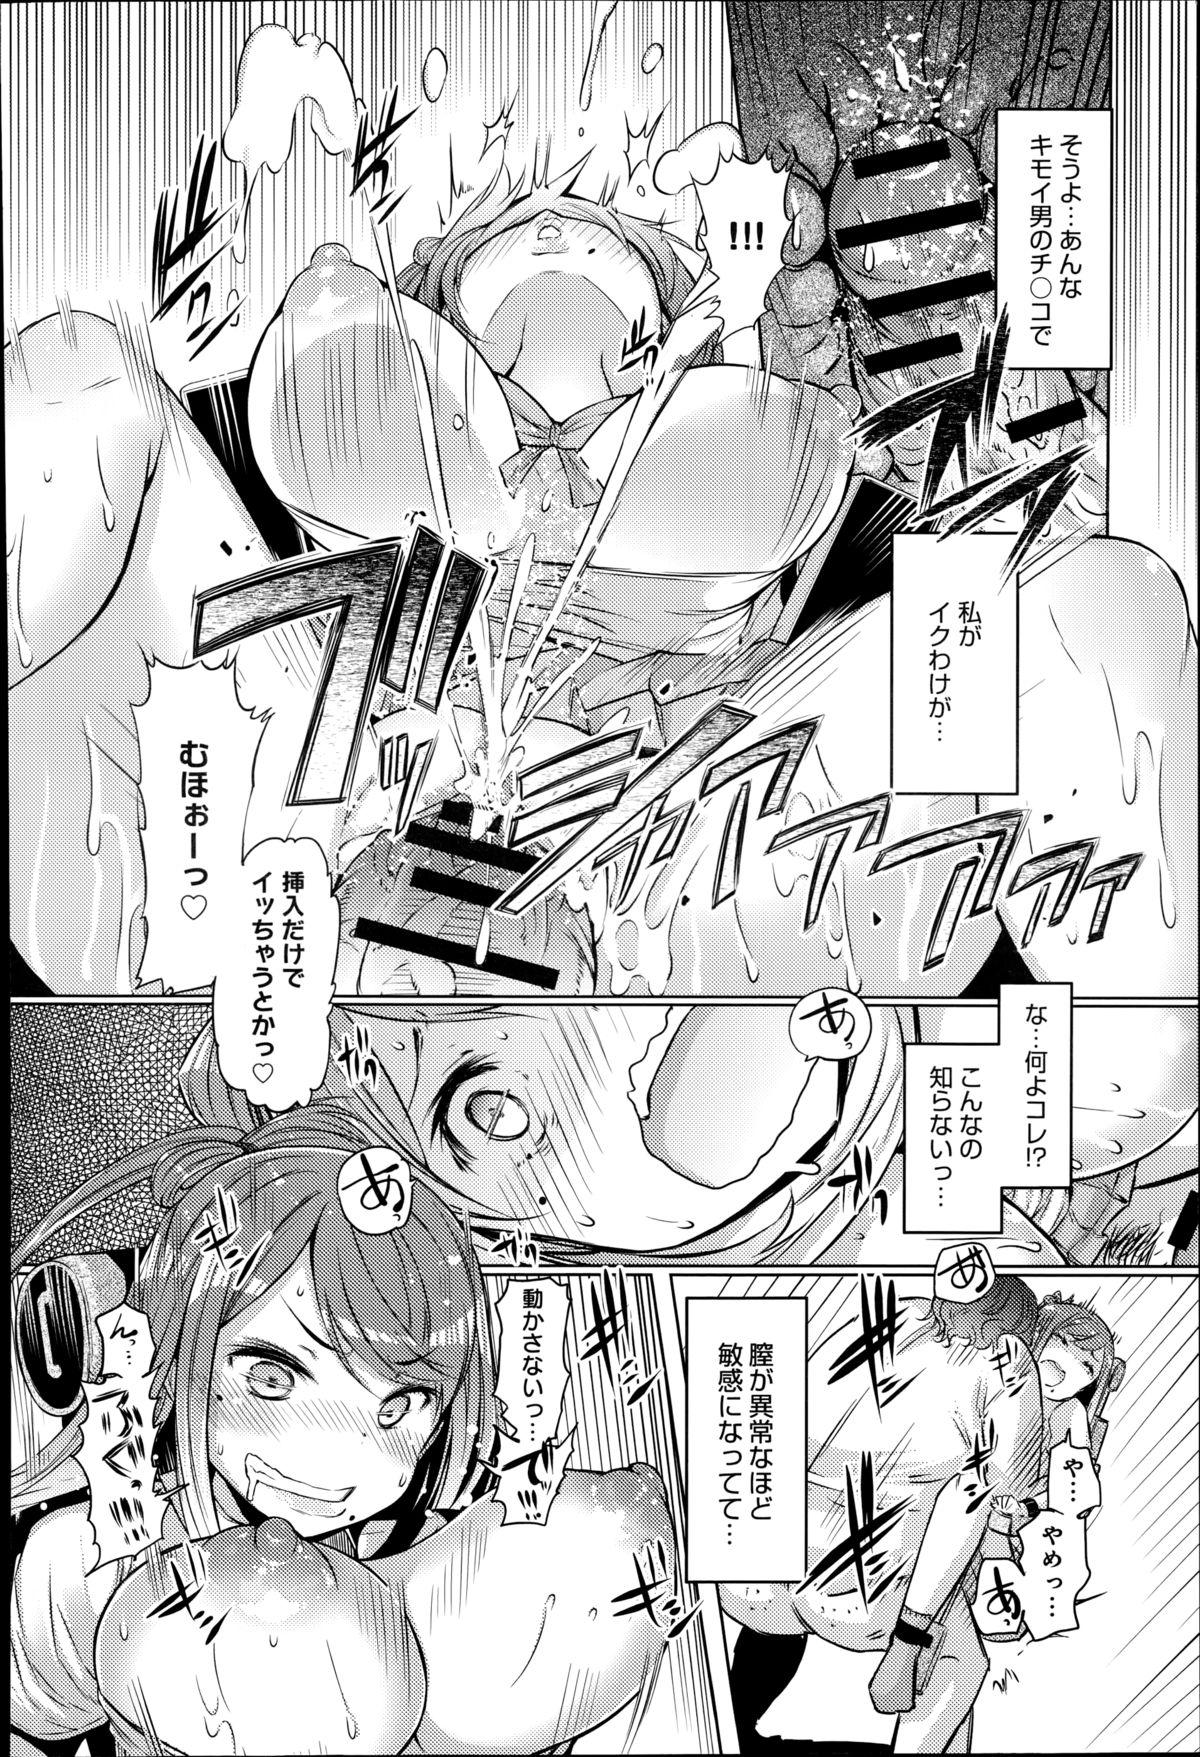 Imouto Kansatsu Nikki 1 days - 2 days 13